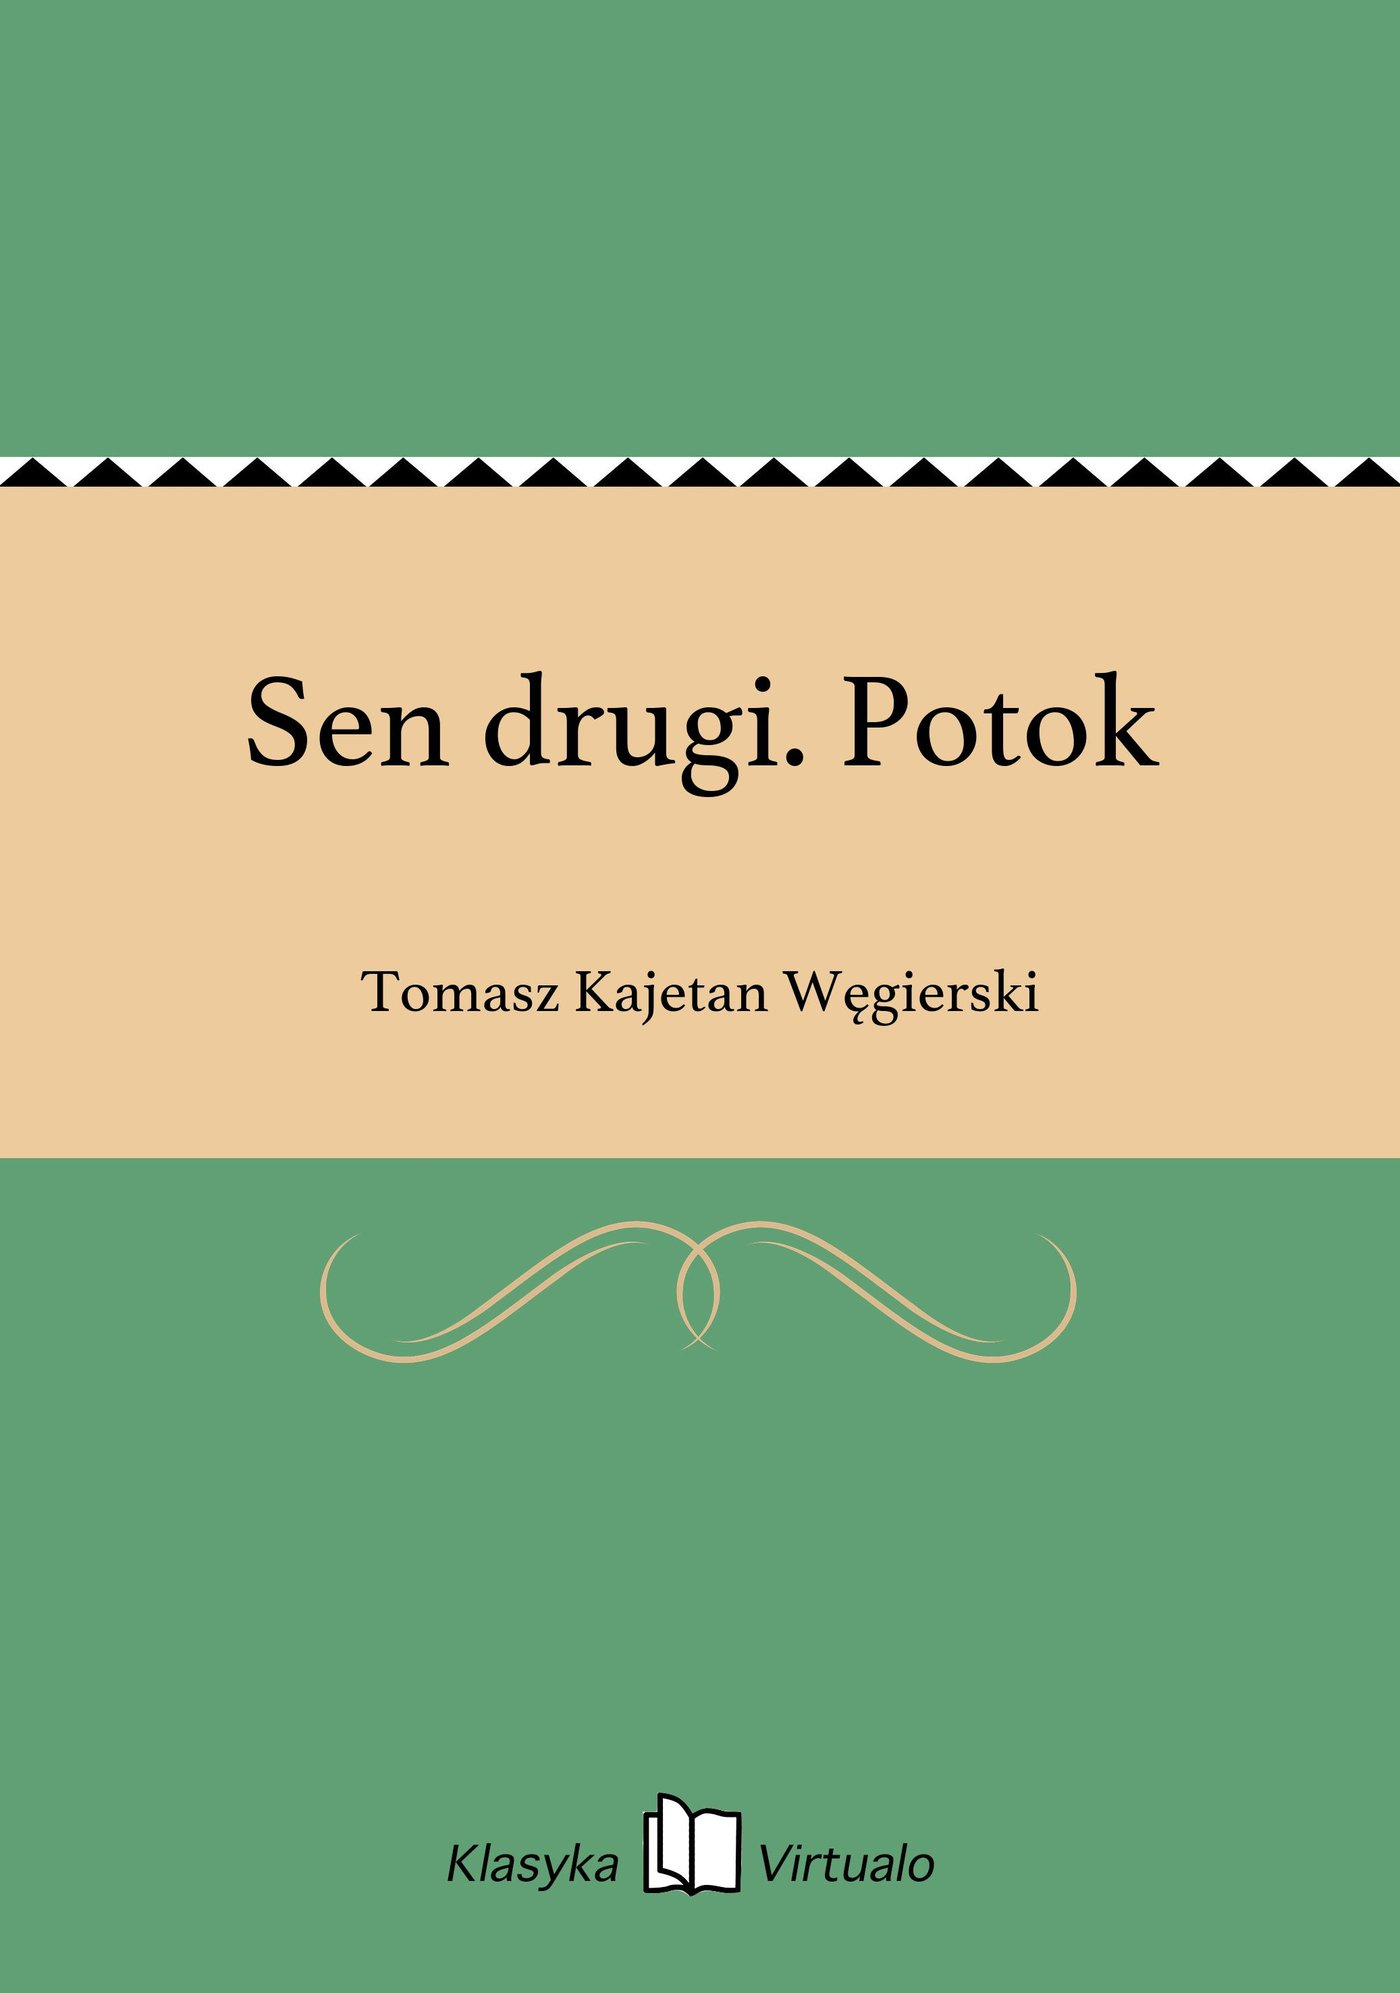 Sen drugi. Potok - Ebook (Książka EPUB) do pobrania w formacie EPUB